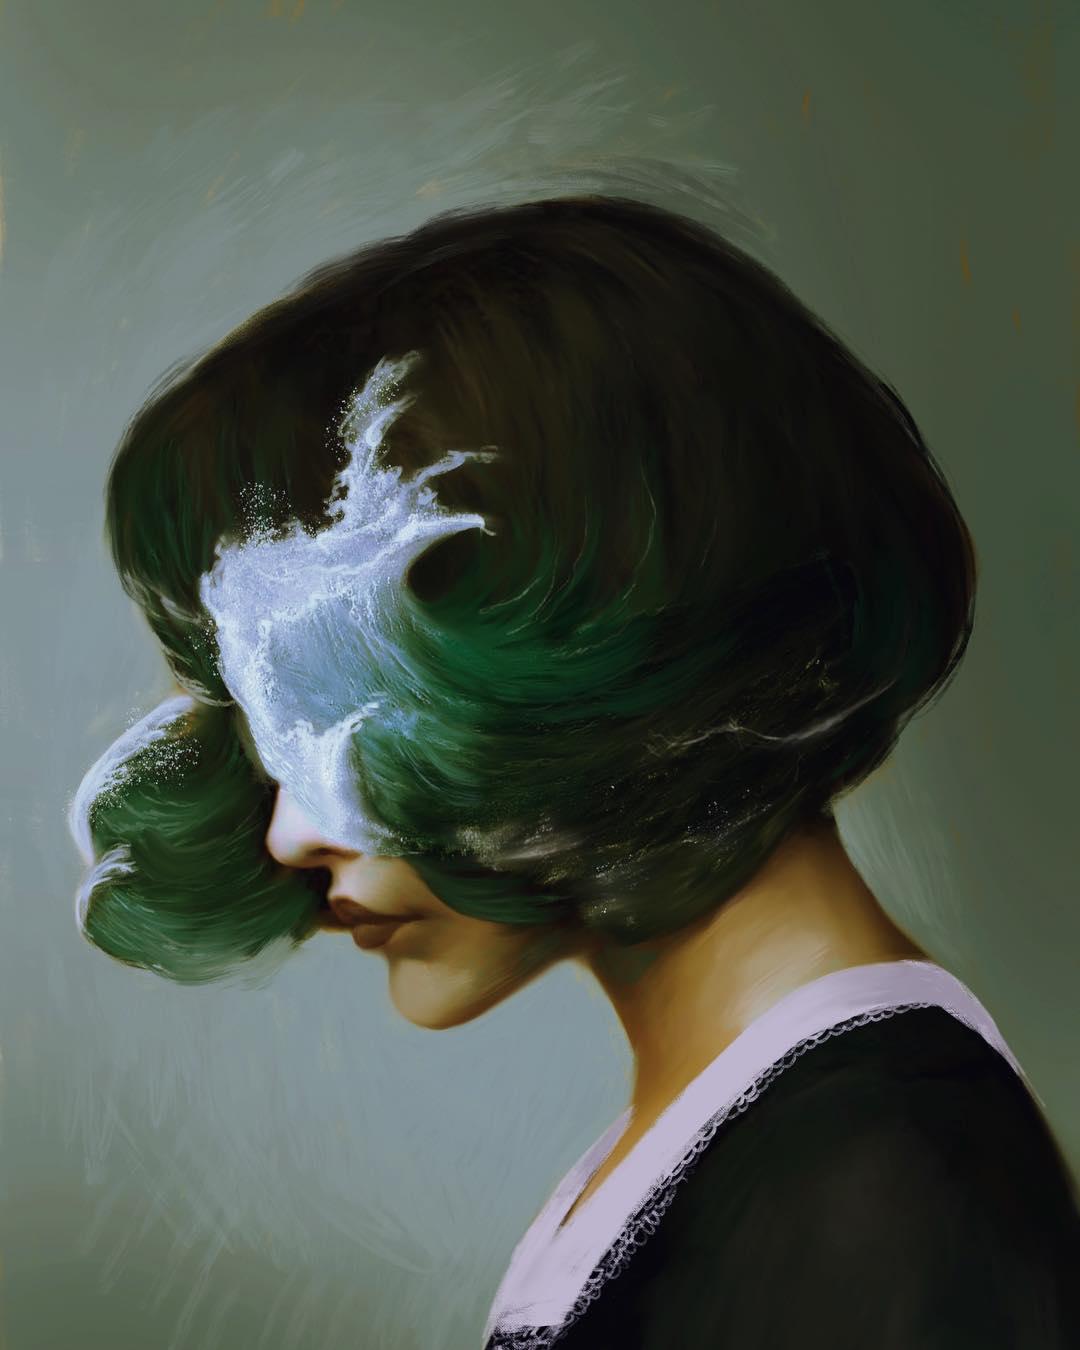 Beautiful Surreal Figurative Artwork by Aykut Aydogdu